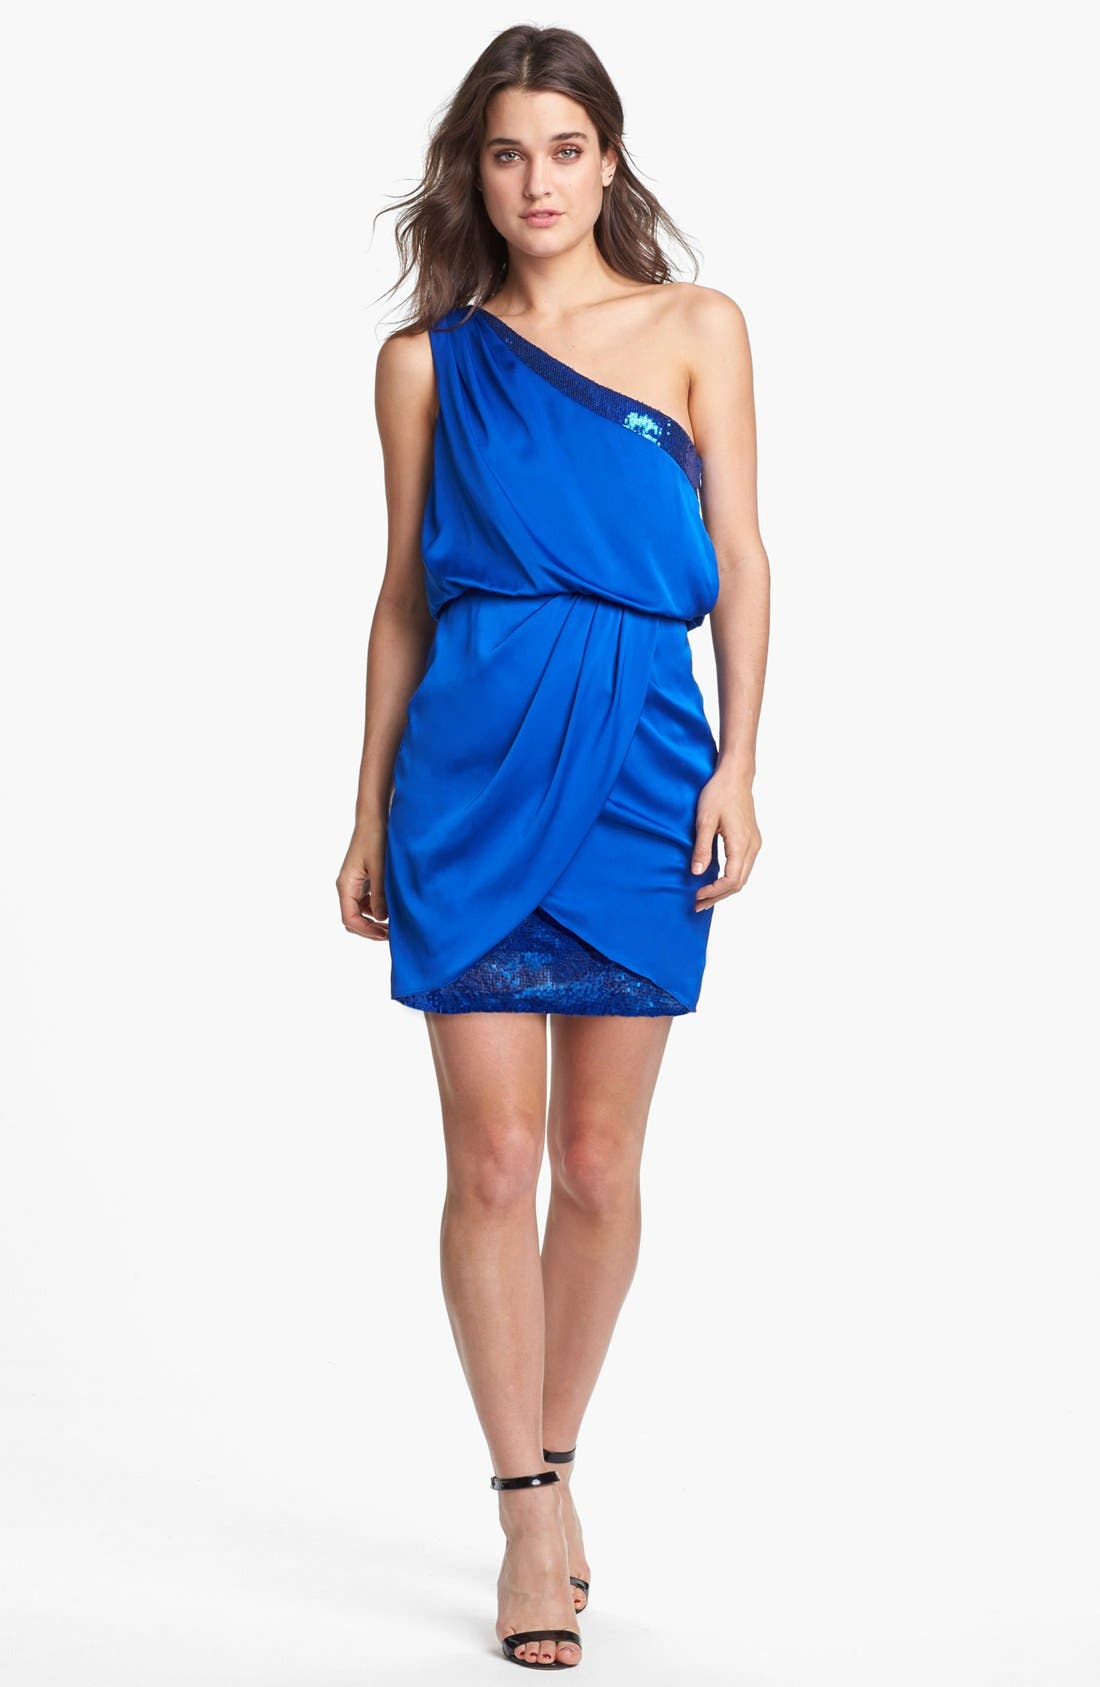 Alternate Image 1 Selected - Aidan by Aidan Mattox Embellished One-Shoulder Blouson Dress